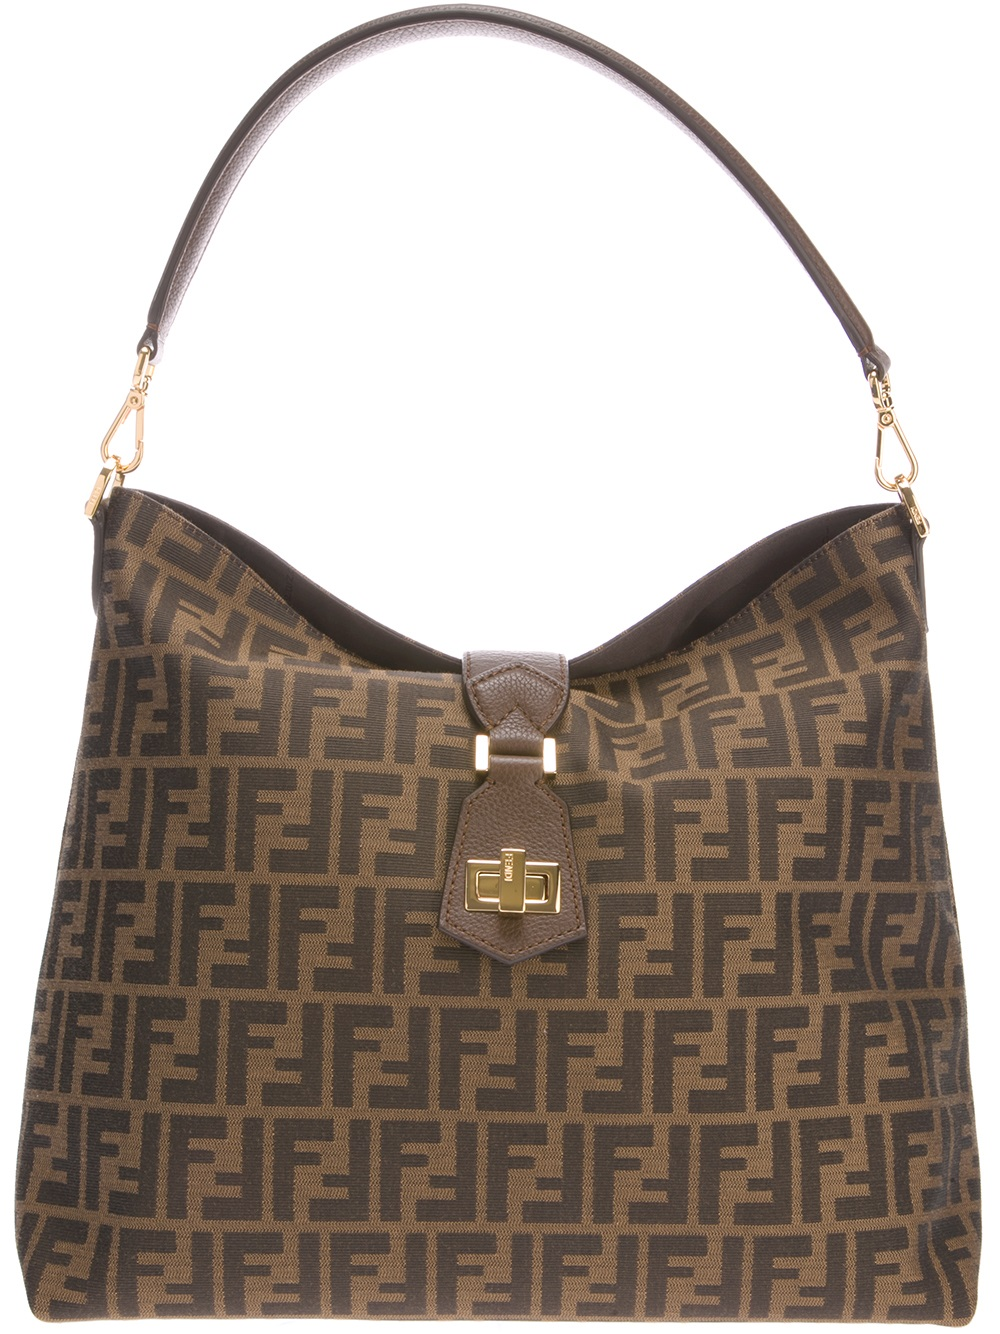 Kate Spade Gold Leather Purse